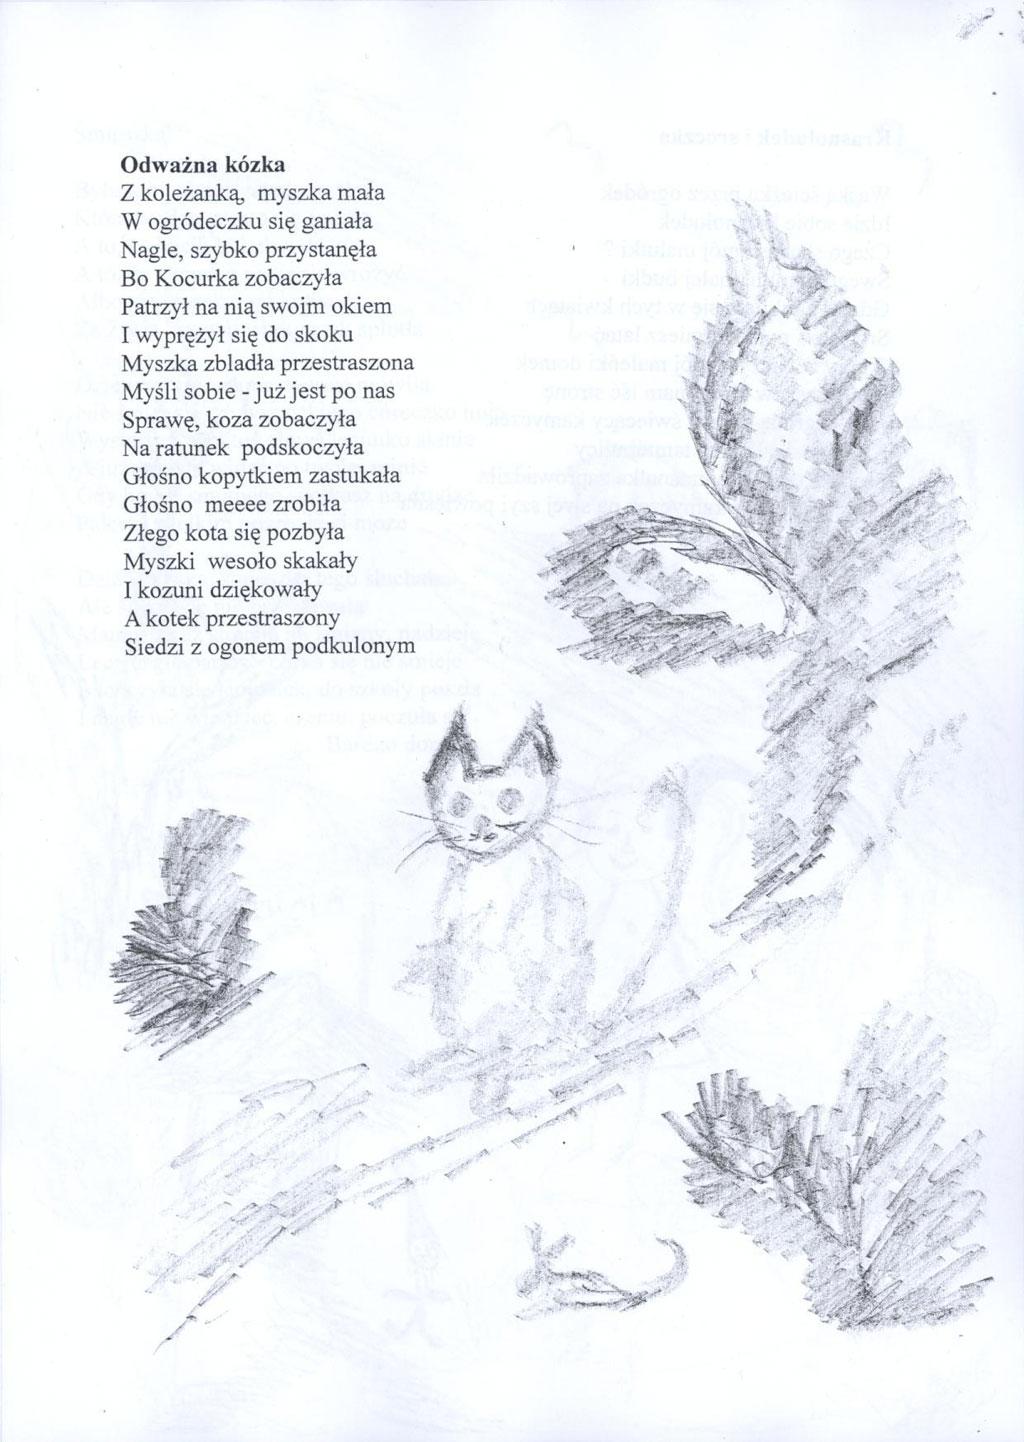 17_11_2016_wiersze_02